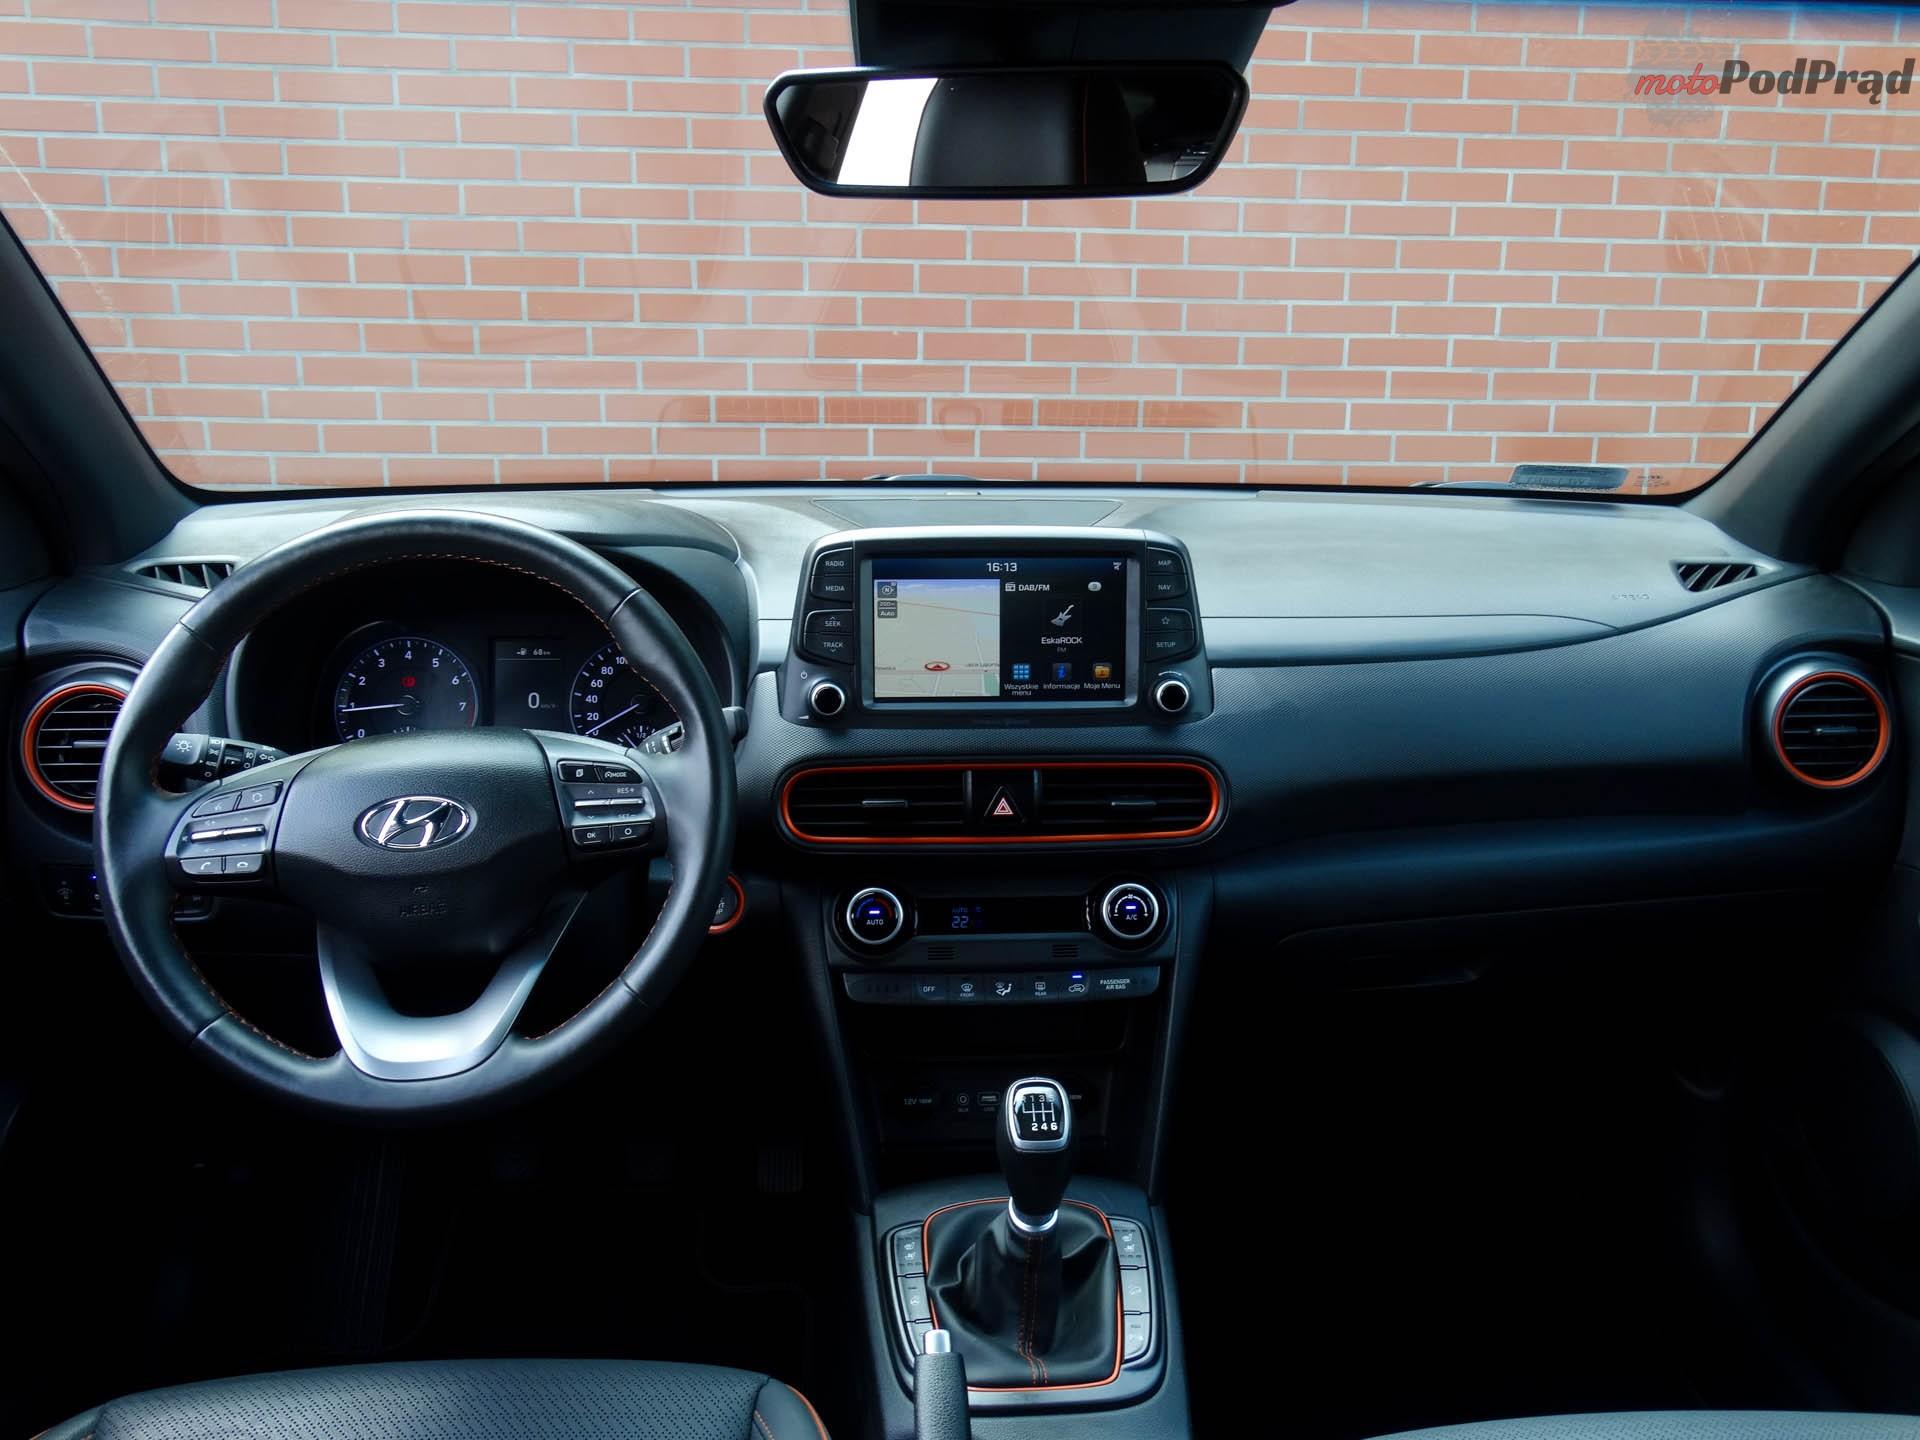 Hyundai Kona 15 Porównanie: Hyundai Kona 1.0 kontra Seat Arona 1.0